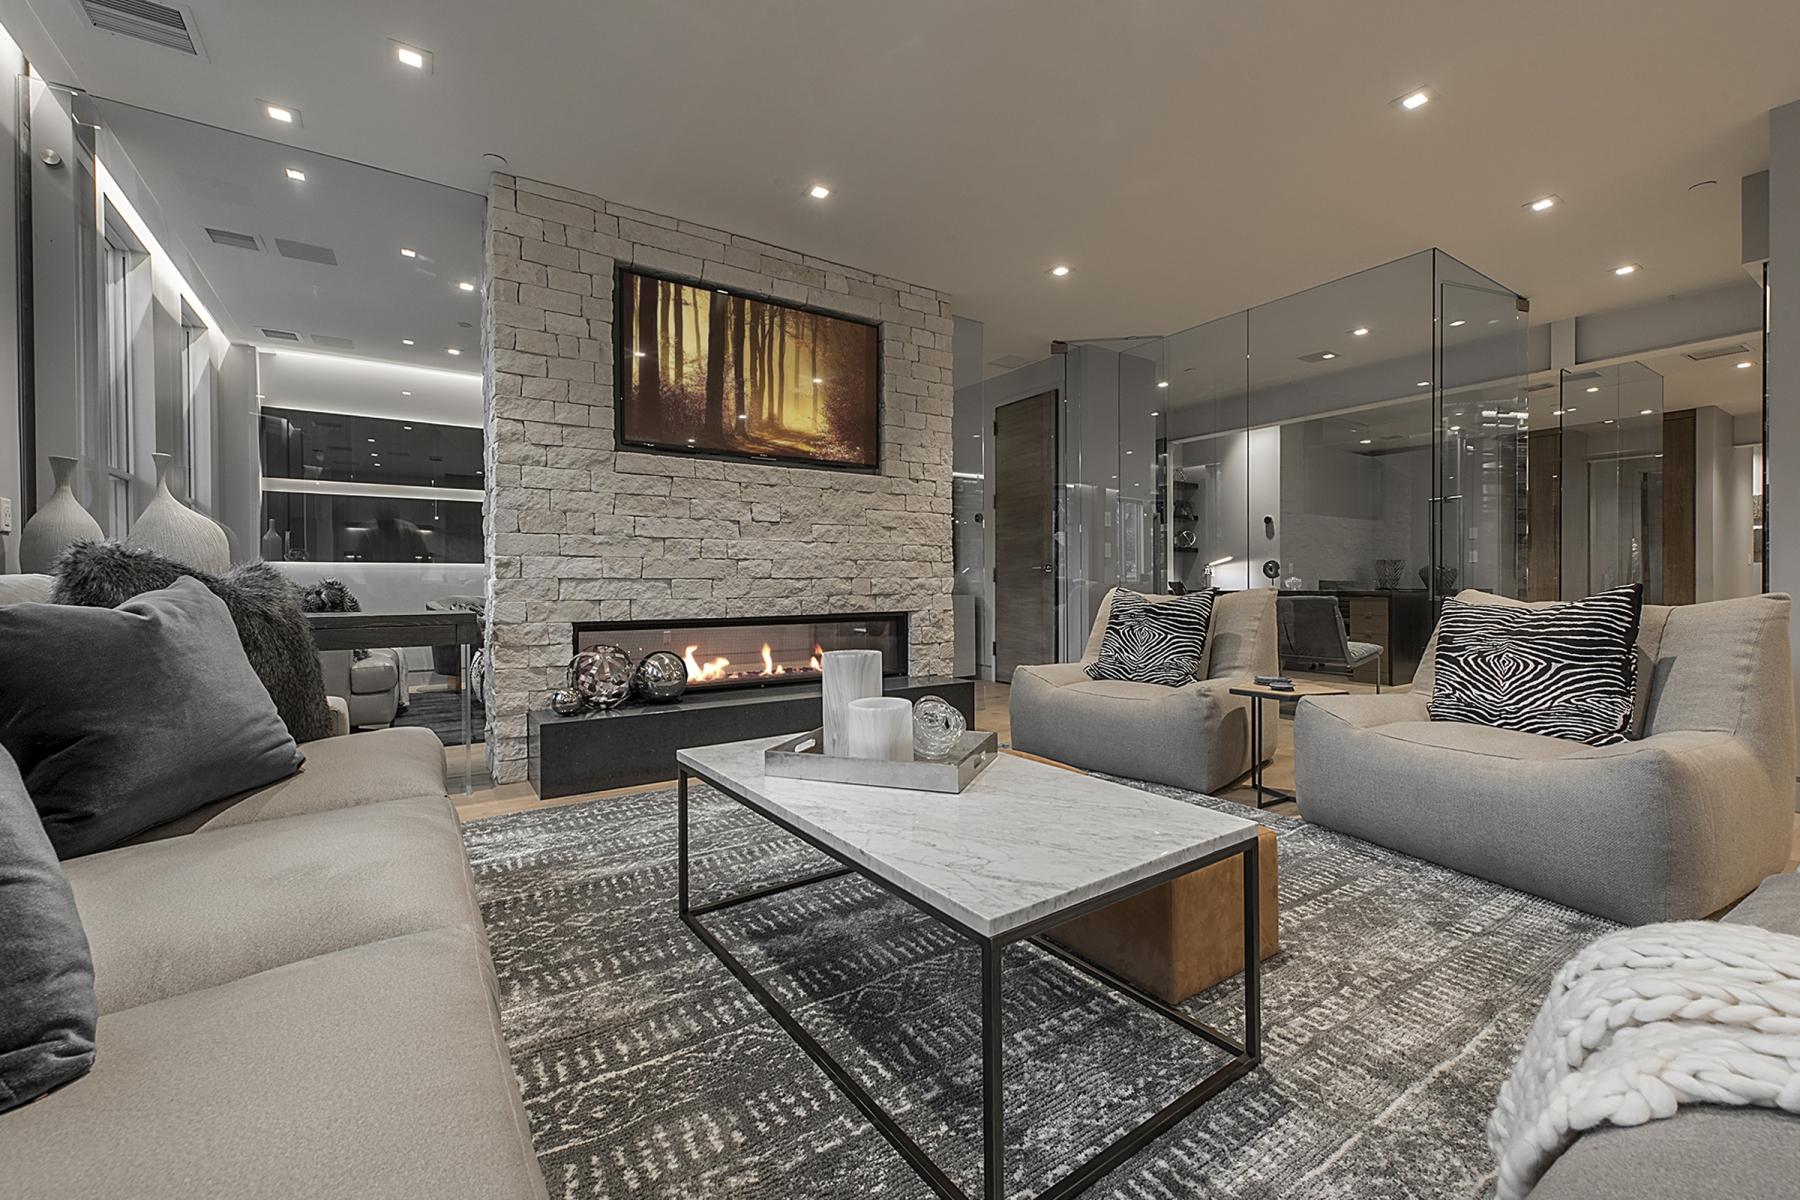 living-room_1800x1200_2443250